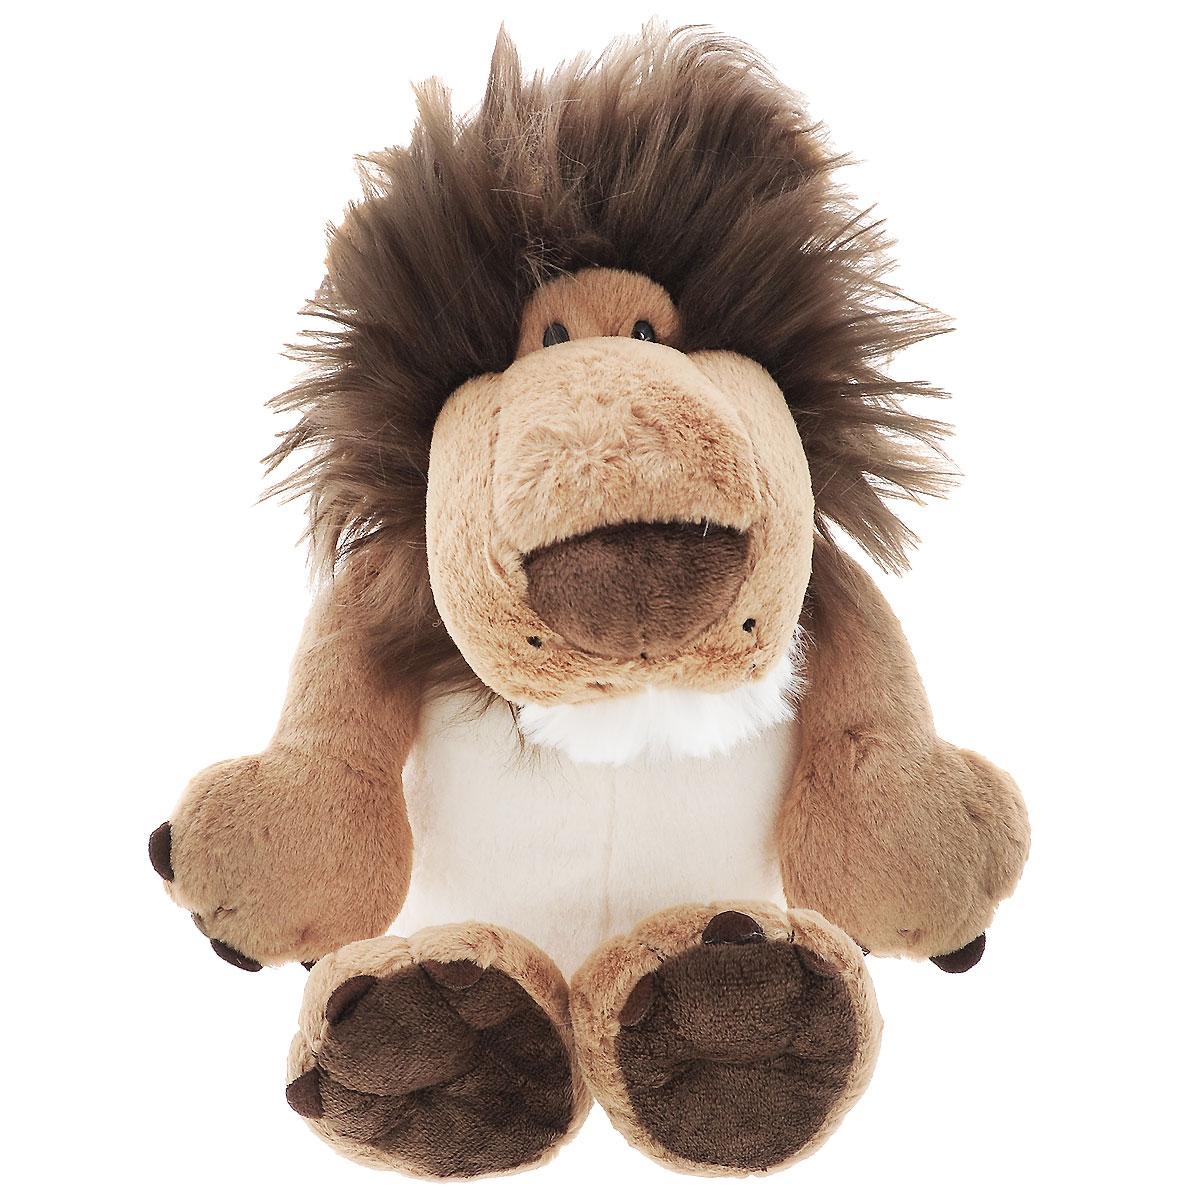 Мягкая игрушка Plush Apple Лев лохматый, 23 см мягкая игрушка plush apple медведь мишуткин с сердцем 30 см